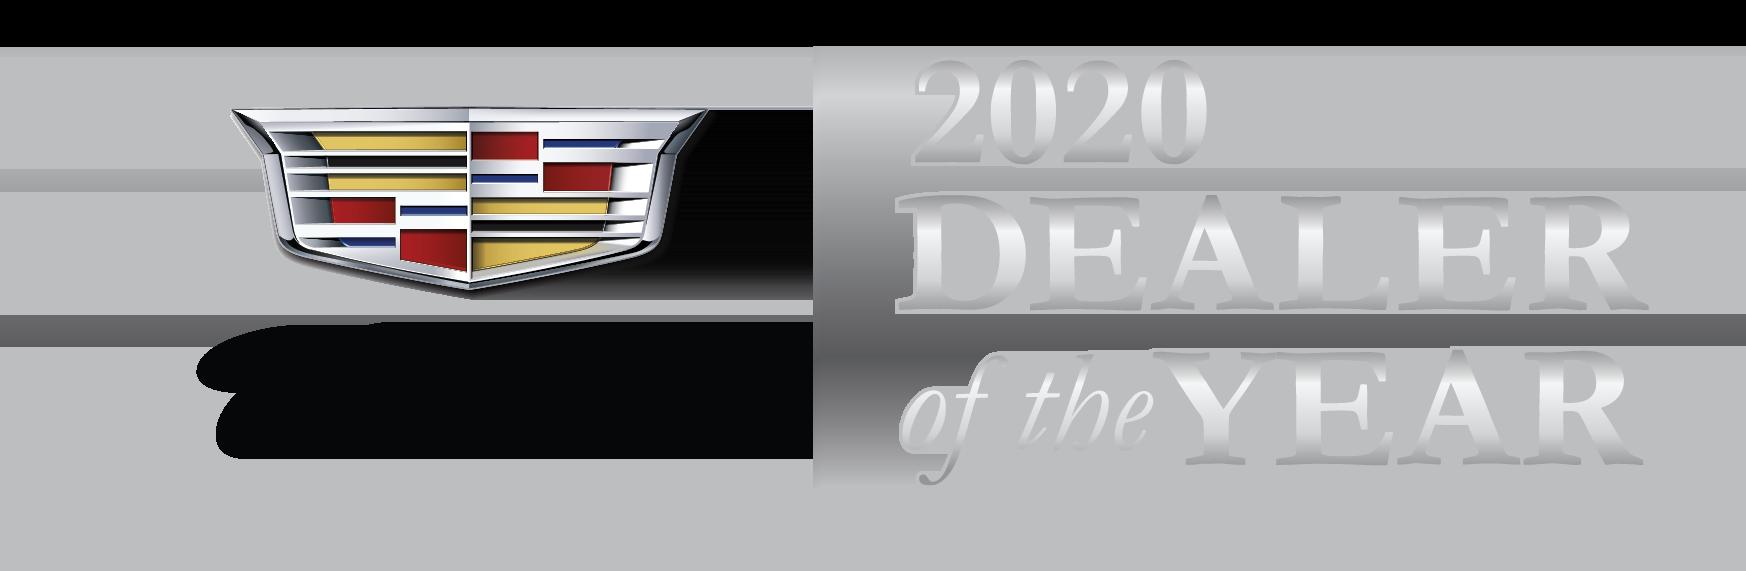 dealer of the year award 2020